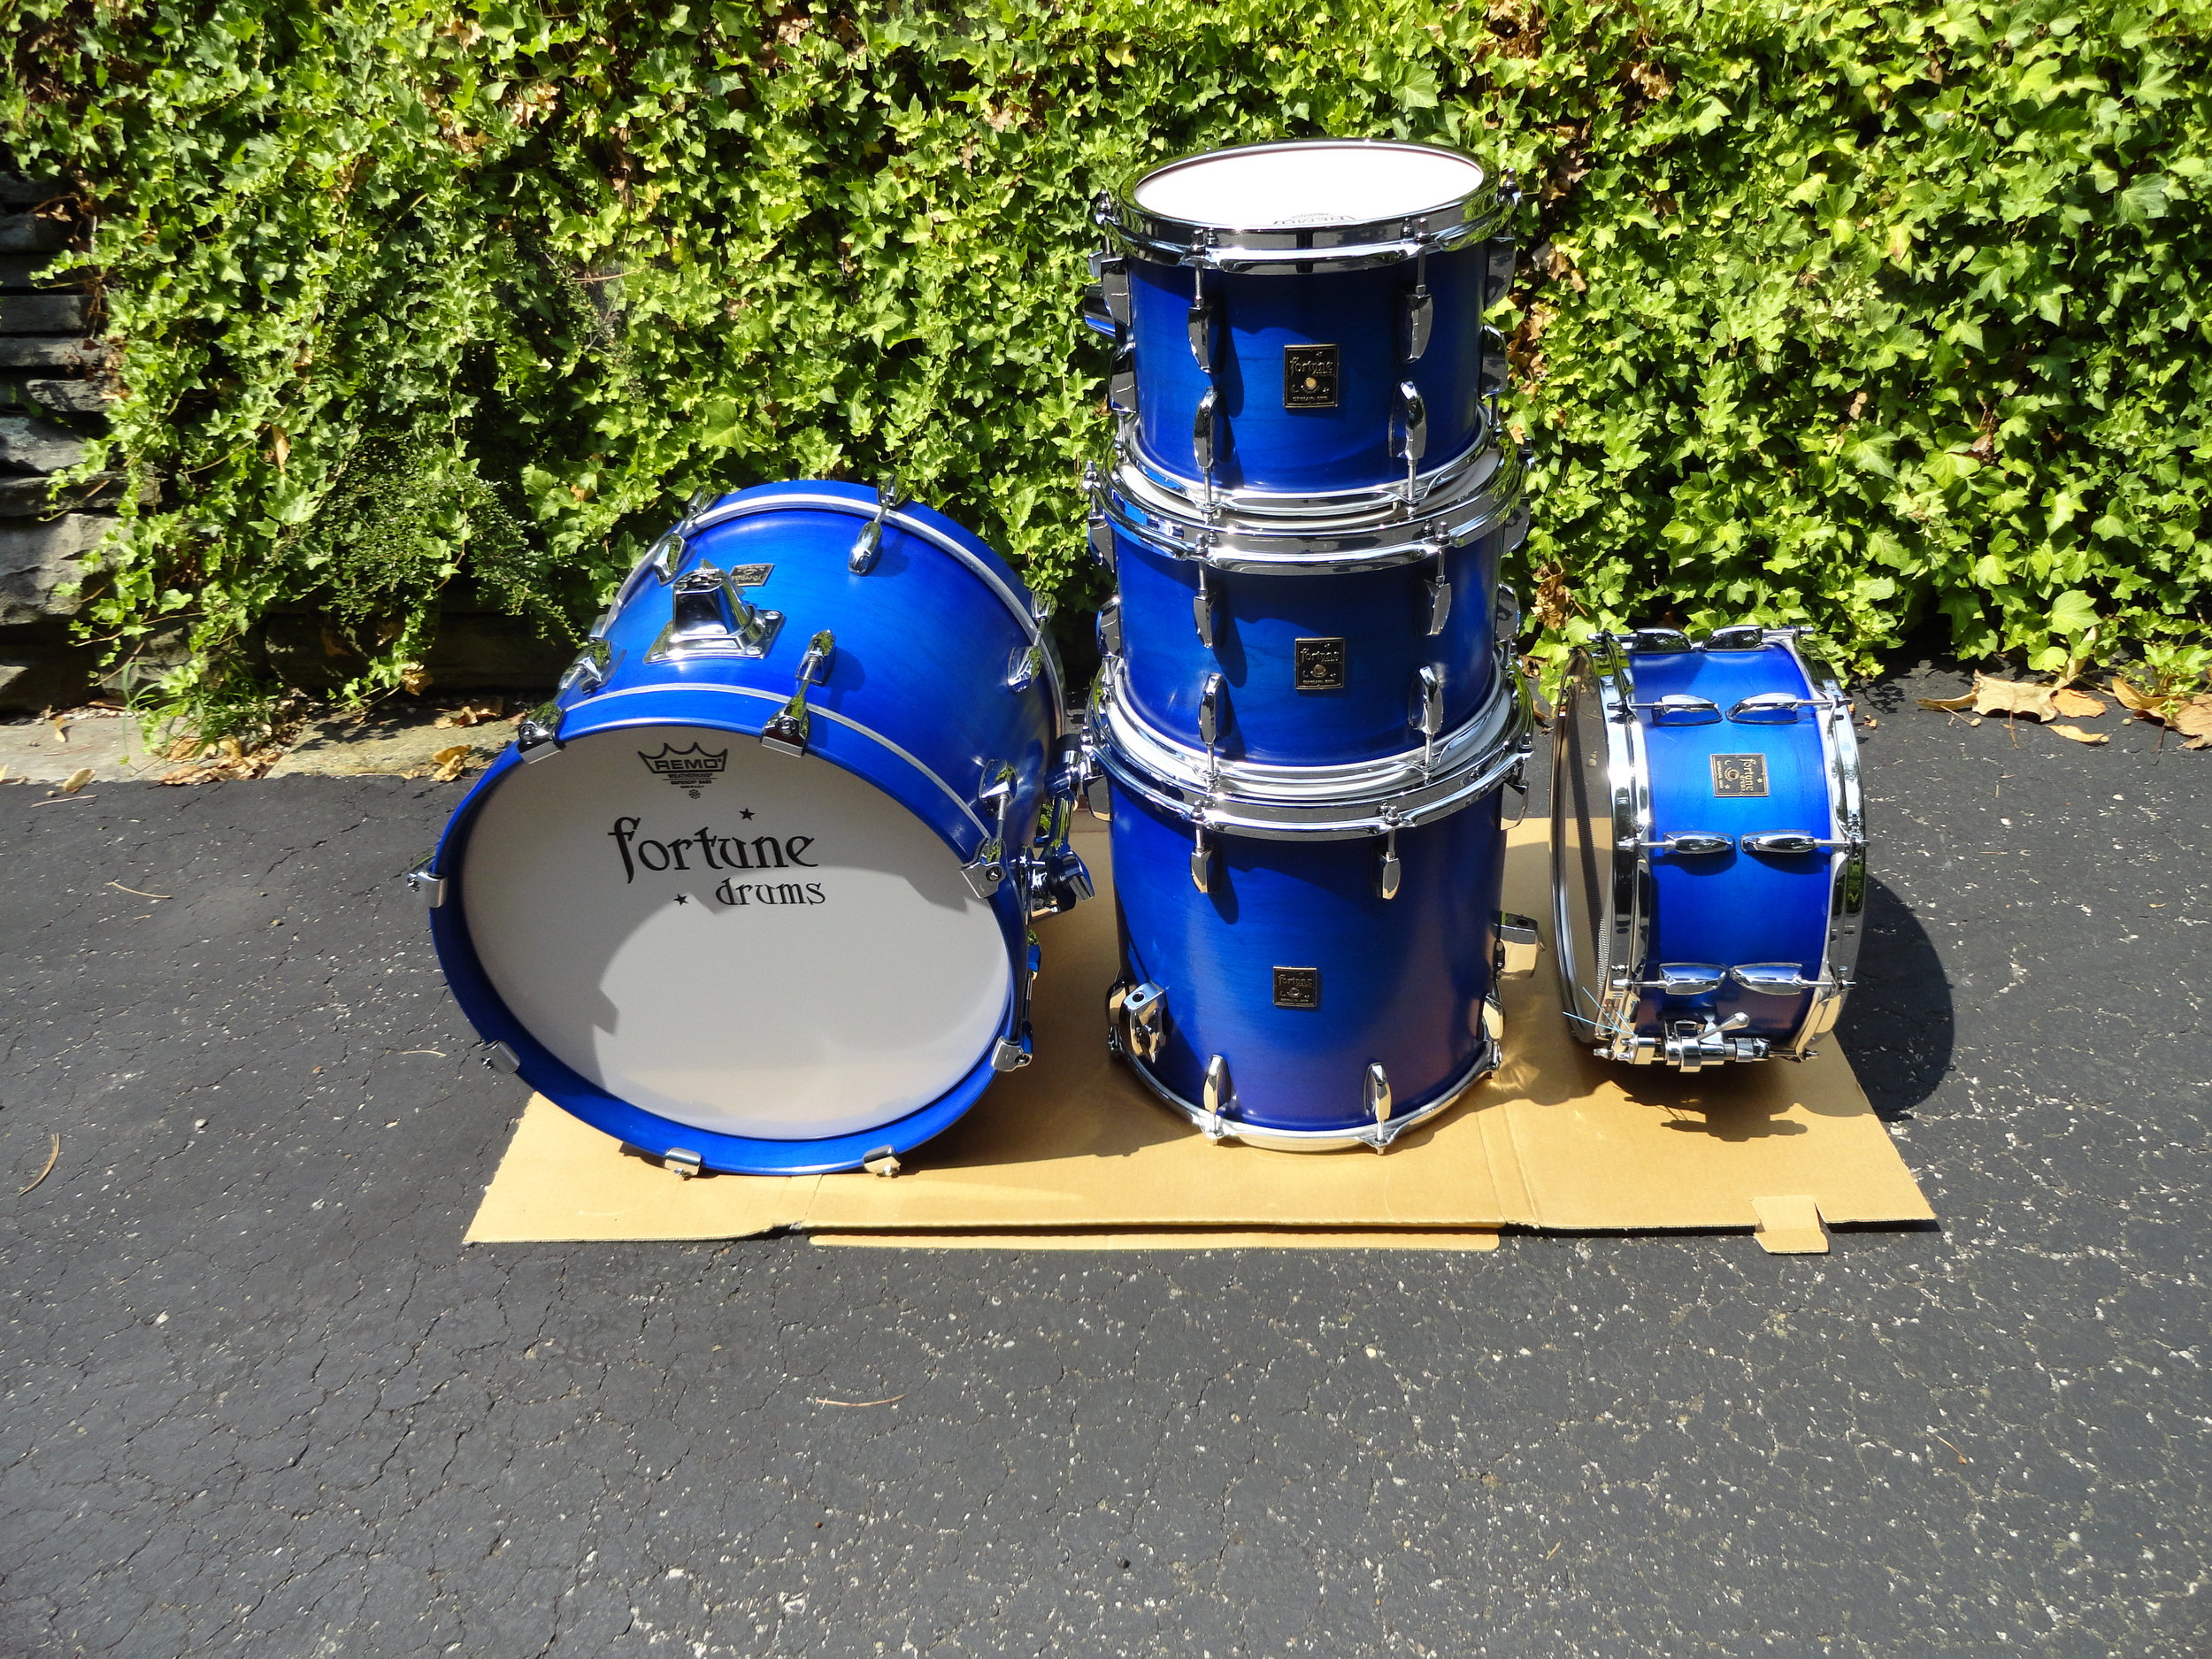 Ricky Exton's Cobalt Blue set